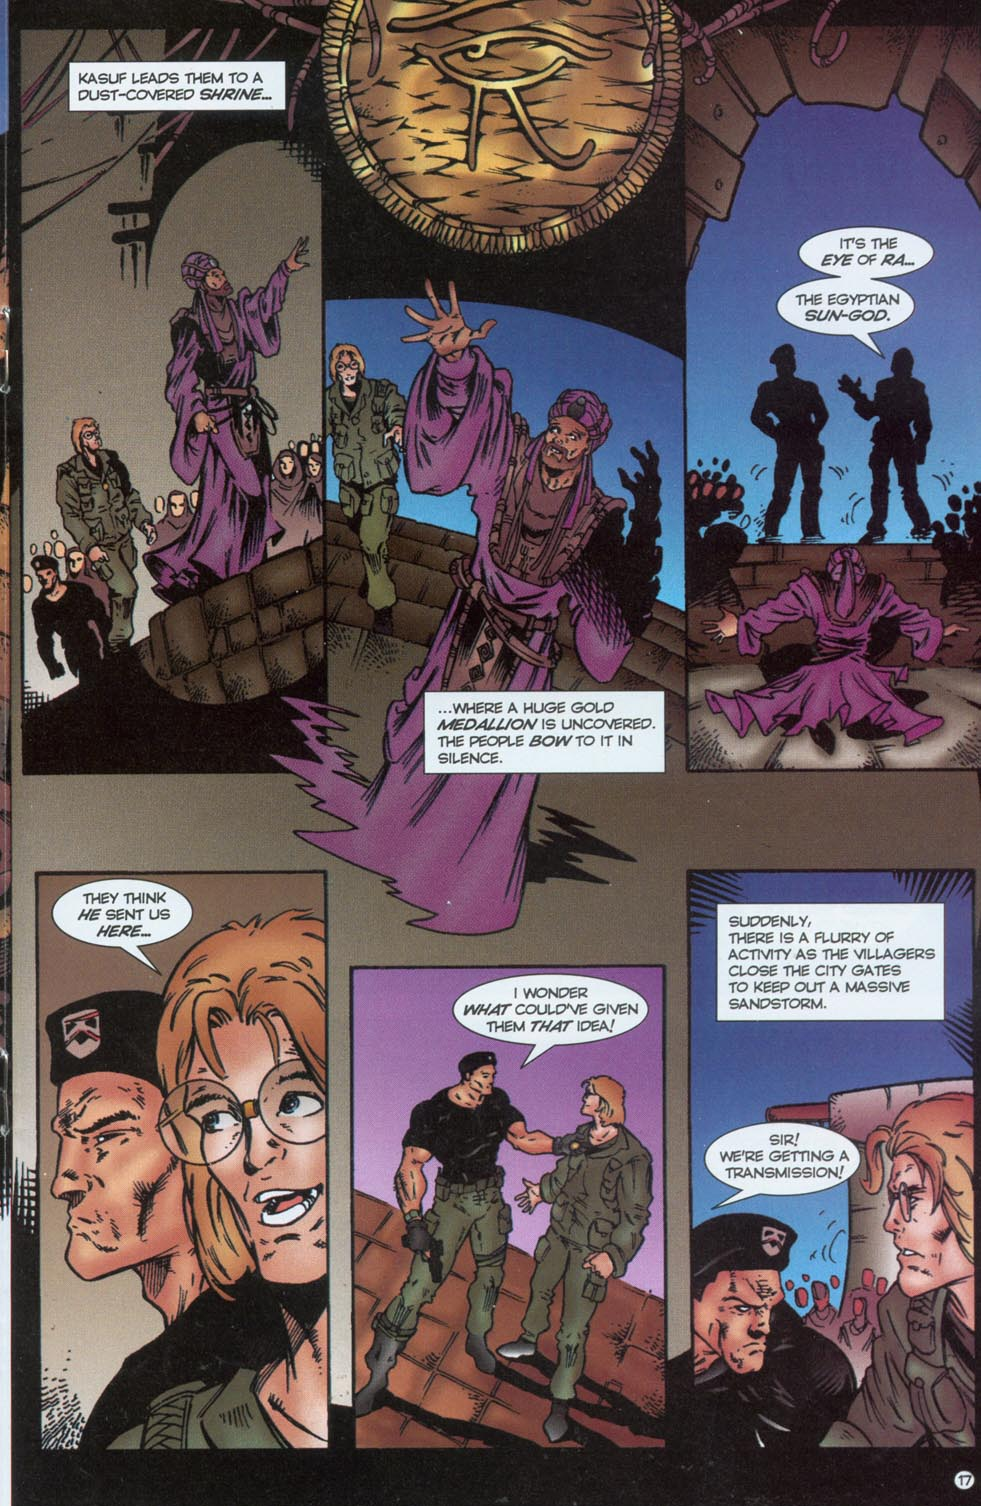 Read online Stargate comic -  Issue #1 - 19